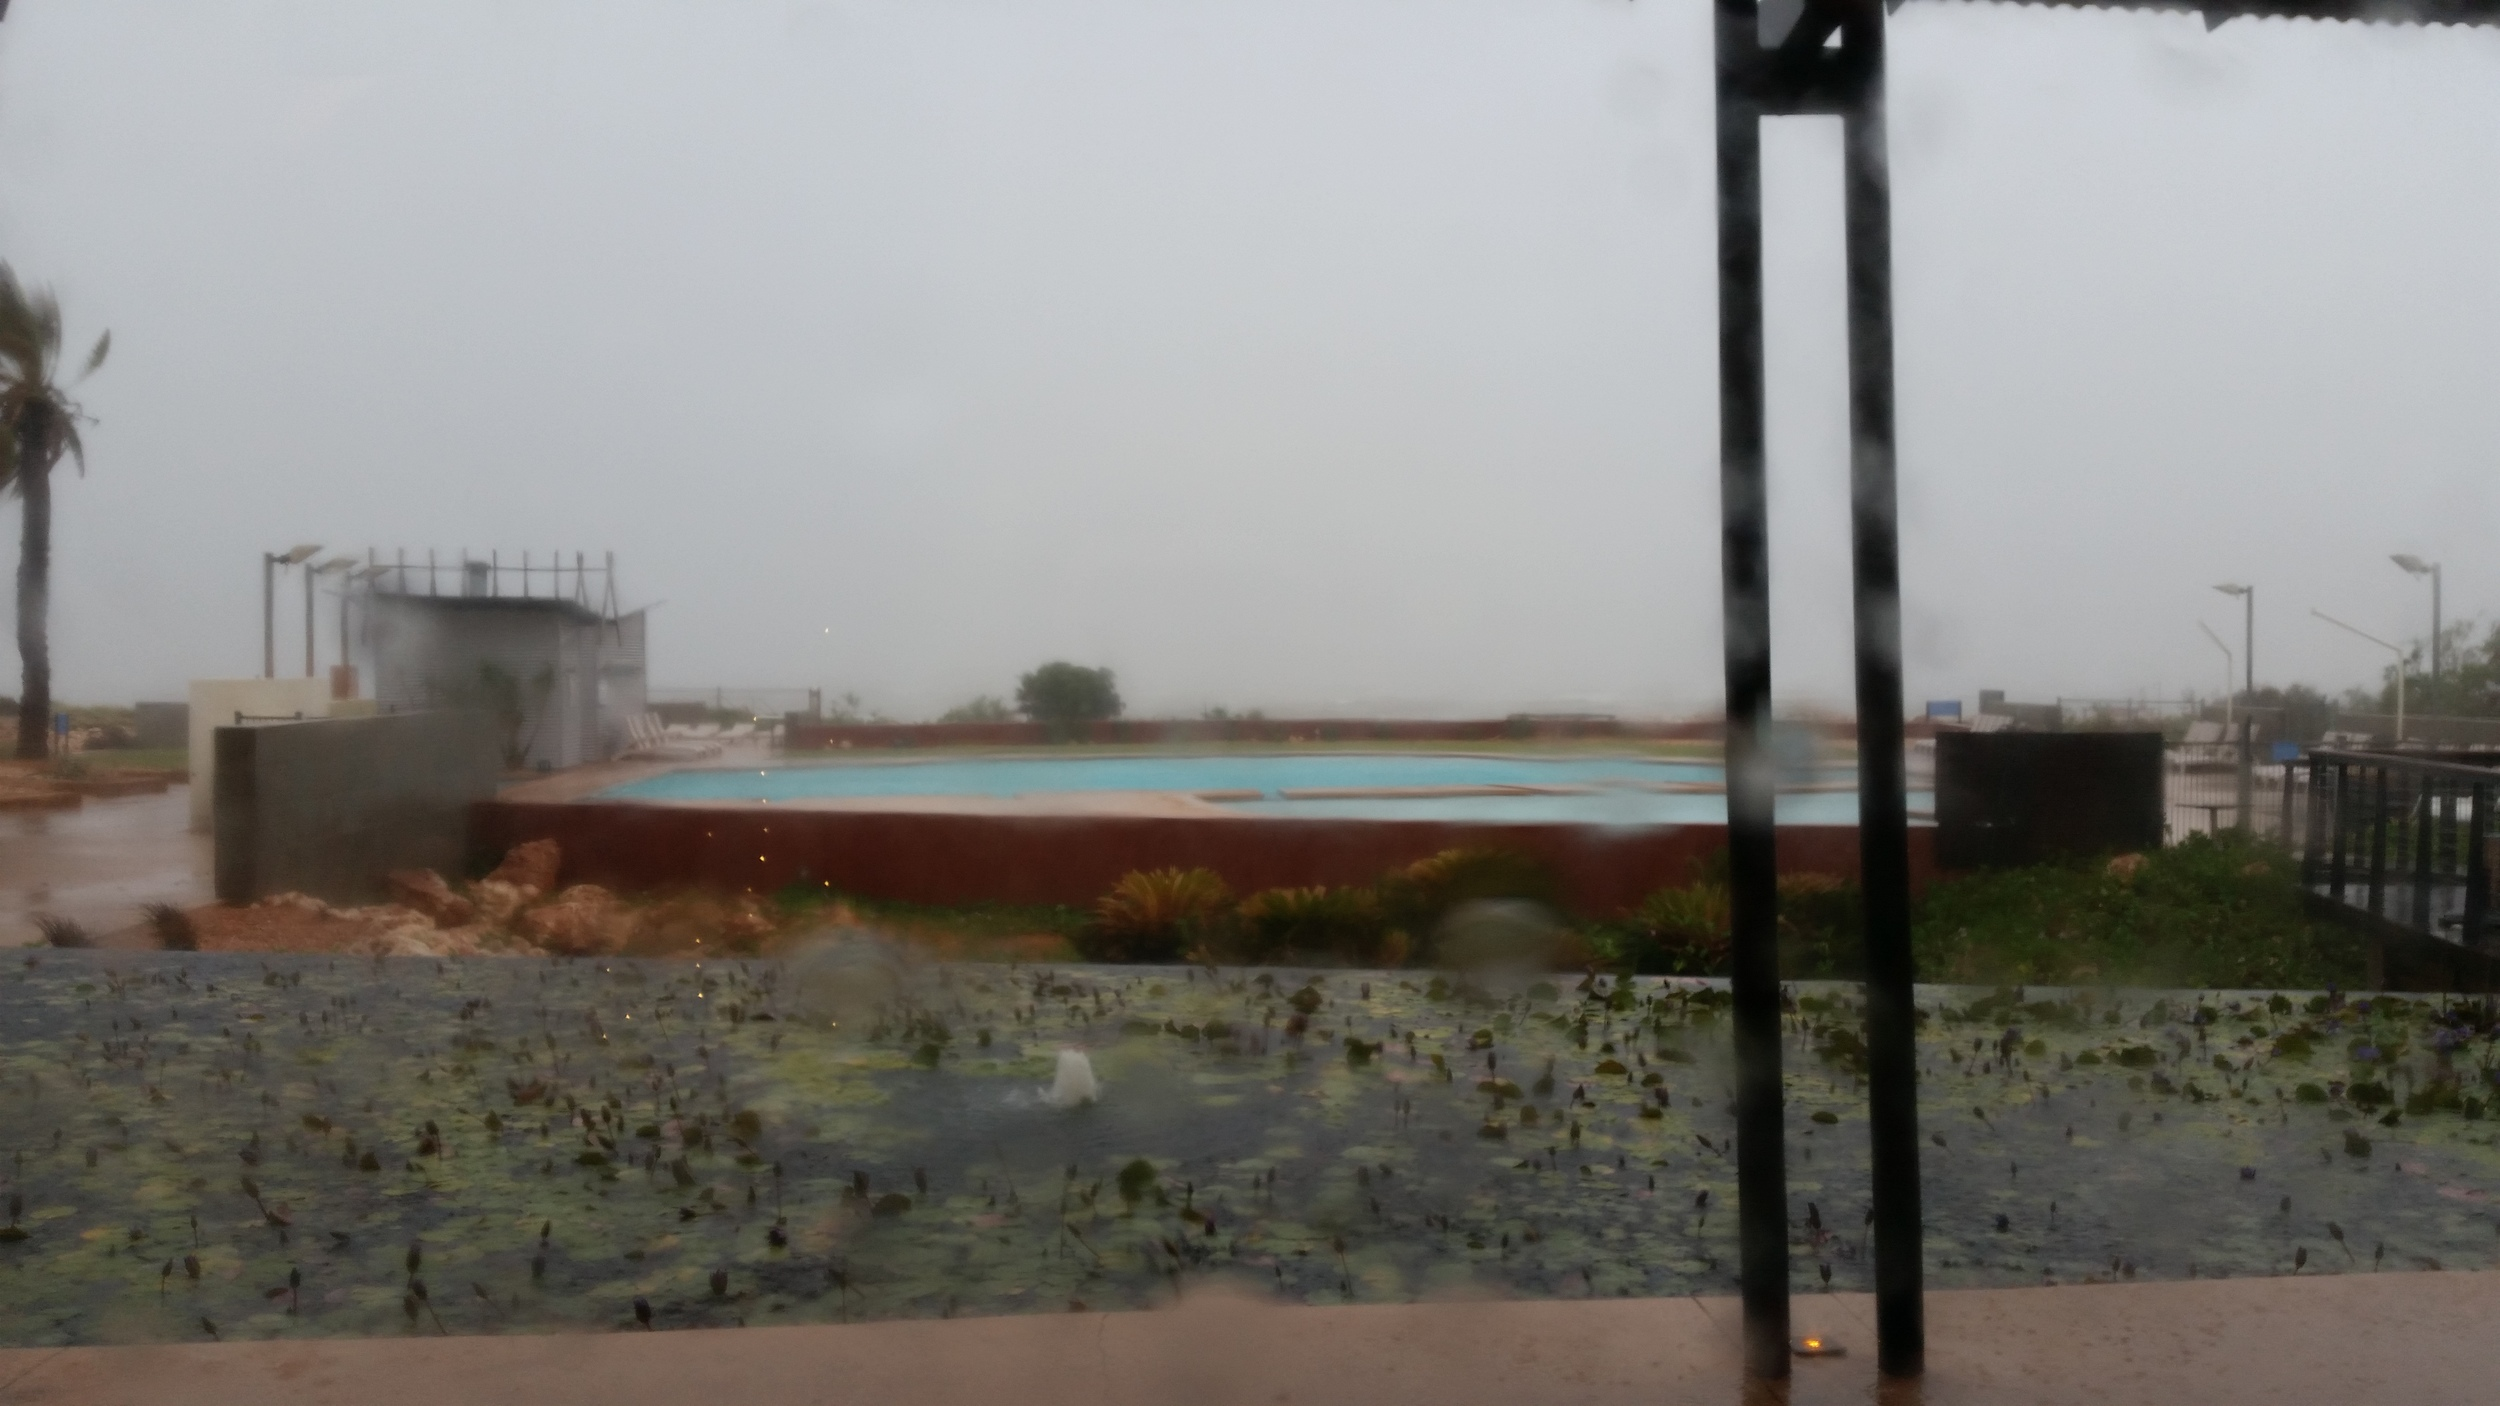 Cyclone Quang